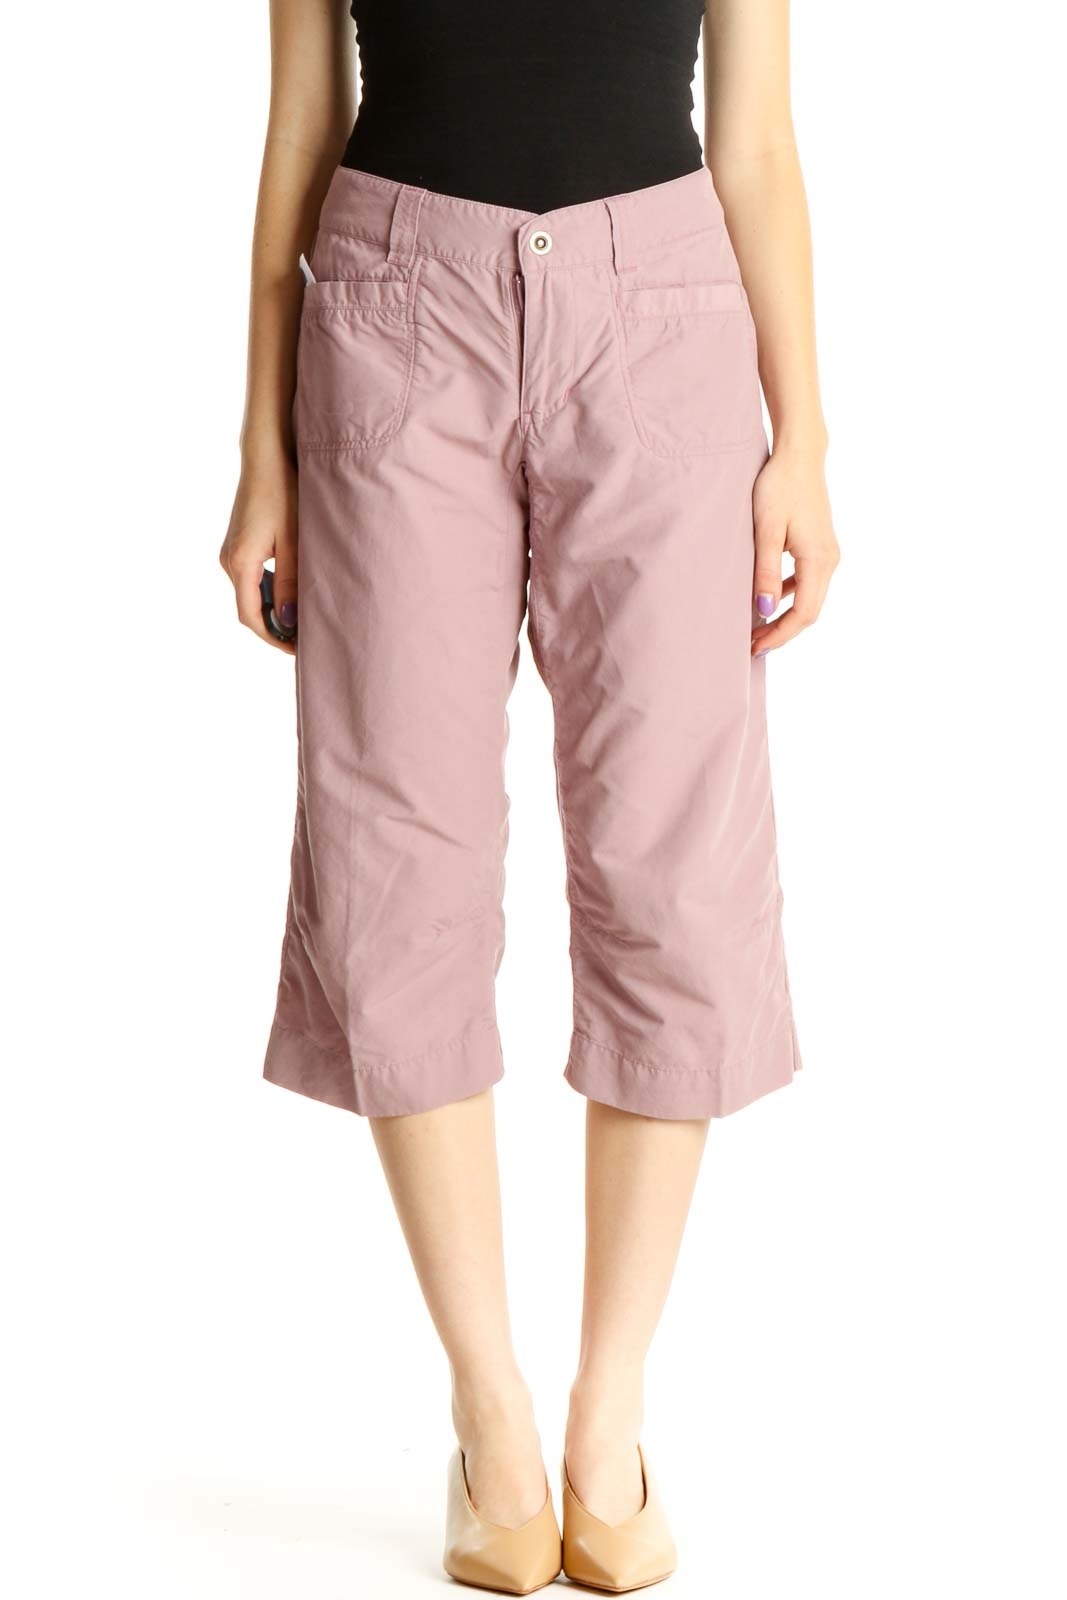 Pink Activewear Cargos Pants Front